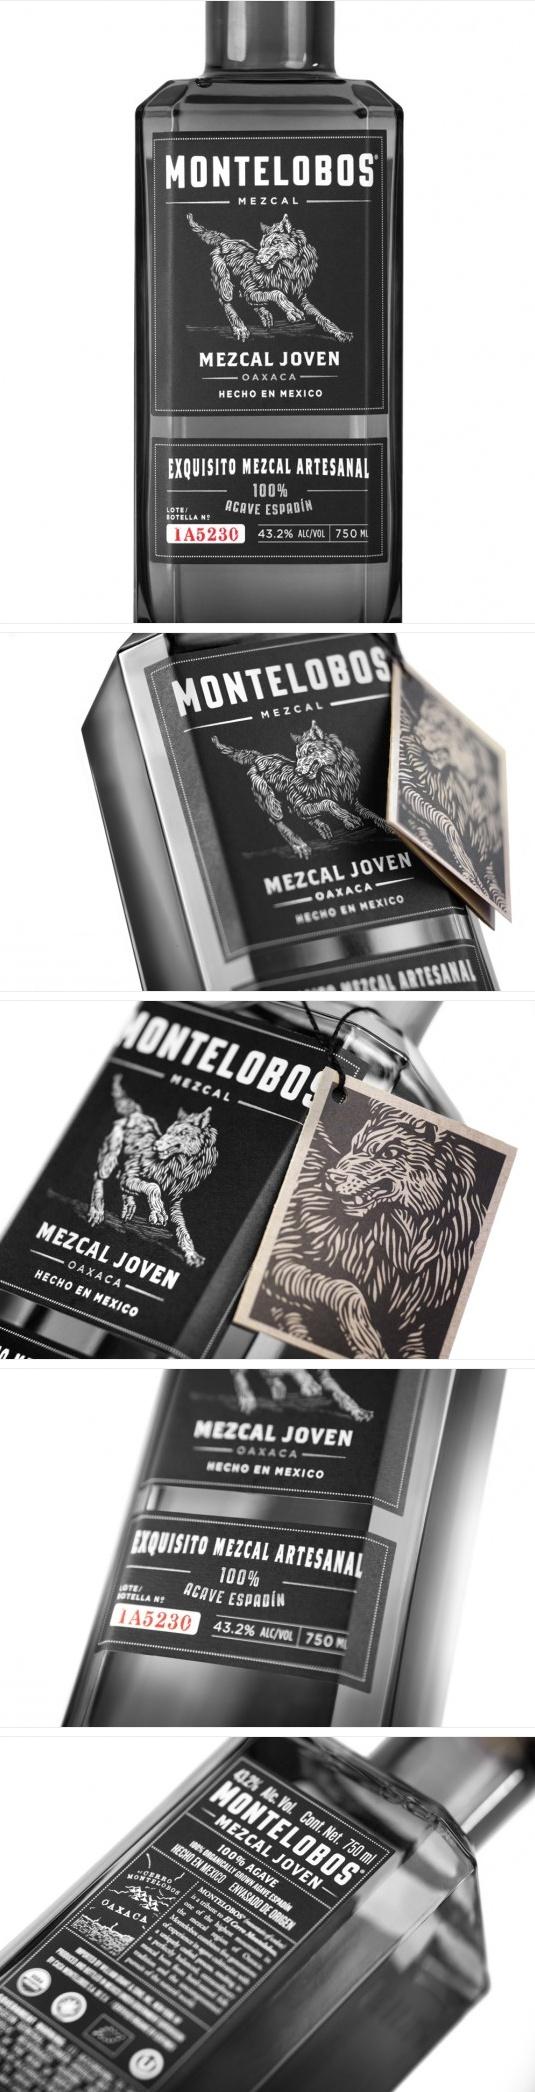 Fabulous illustration on the packaging label Montelobos Mezcal PD